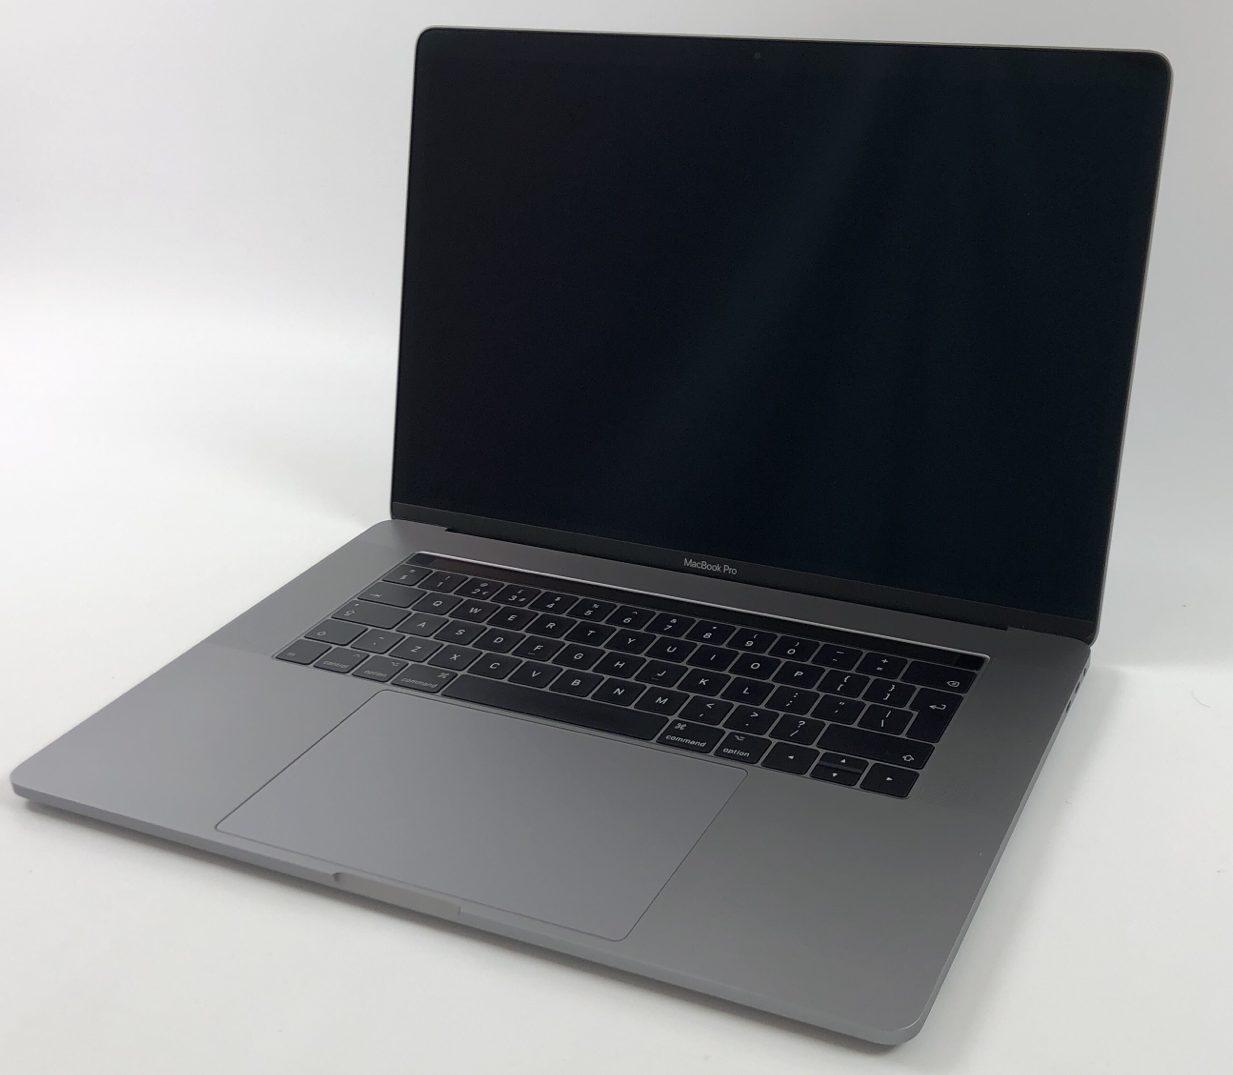 "MacBook Pro 15"" Touch Bar Late 2016 (Intel Quad-Core i7 2.6 GHz 16 GB RAM 256 GB SSD), Space Gray, Intel Quad-Core i7 2.6 GHz, 16 GB RAM, 256 GB SSD, image 1"